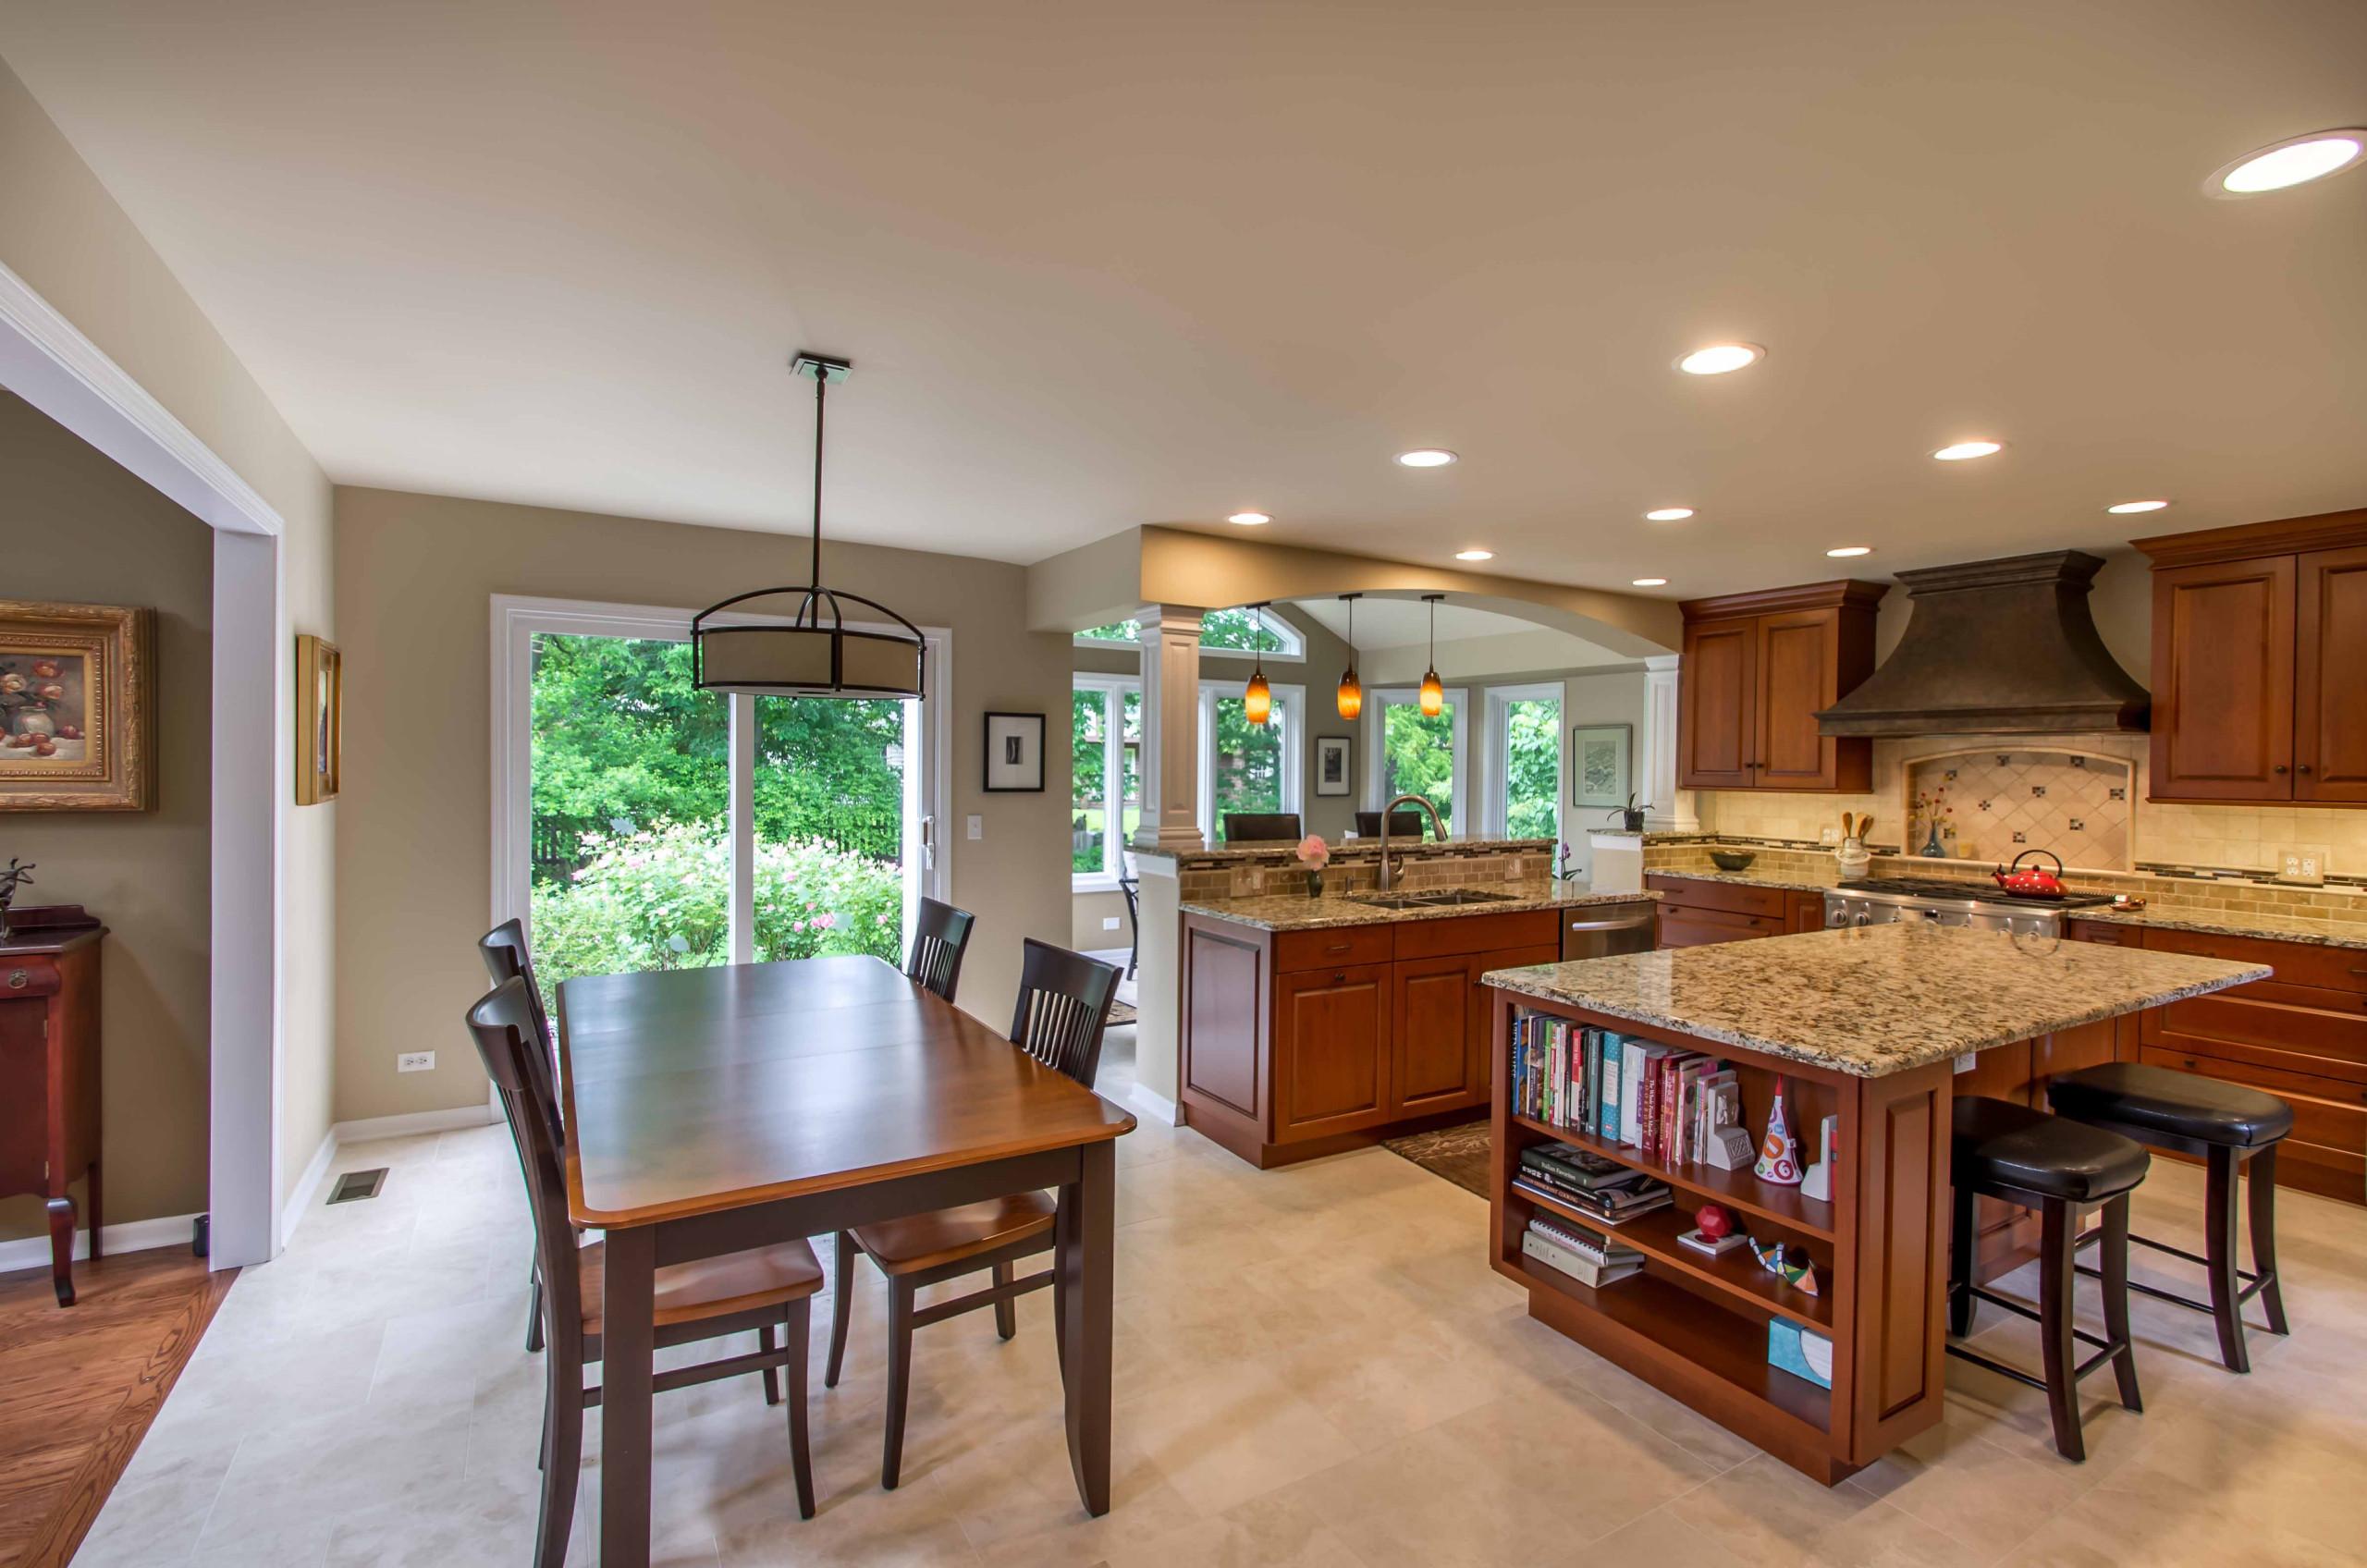 Double Island Kitchen & Sunroom